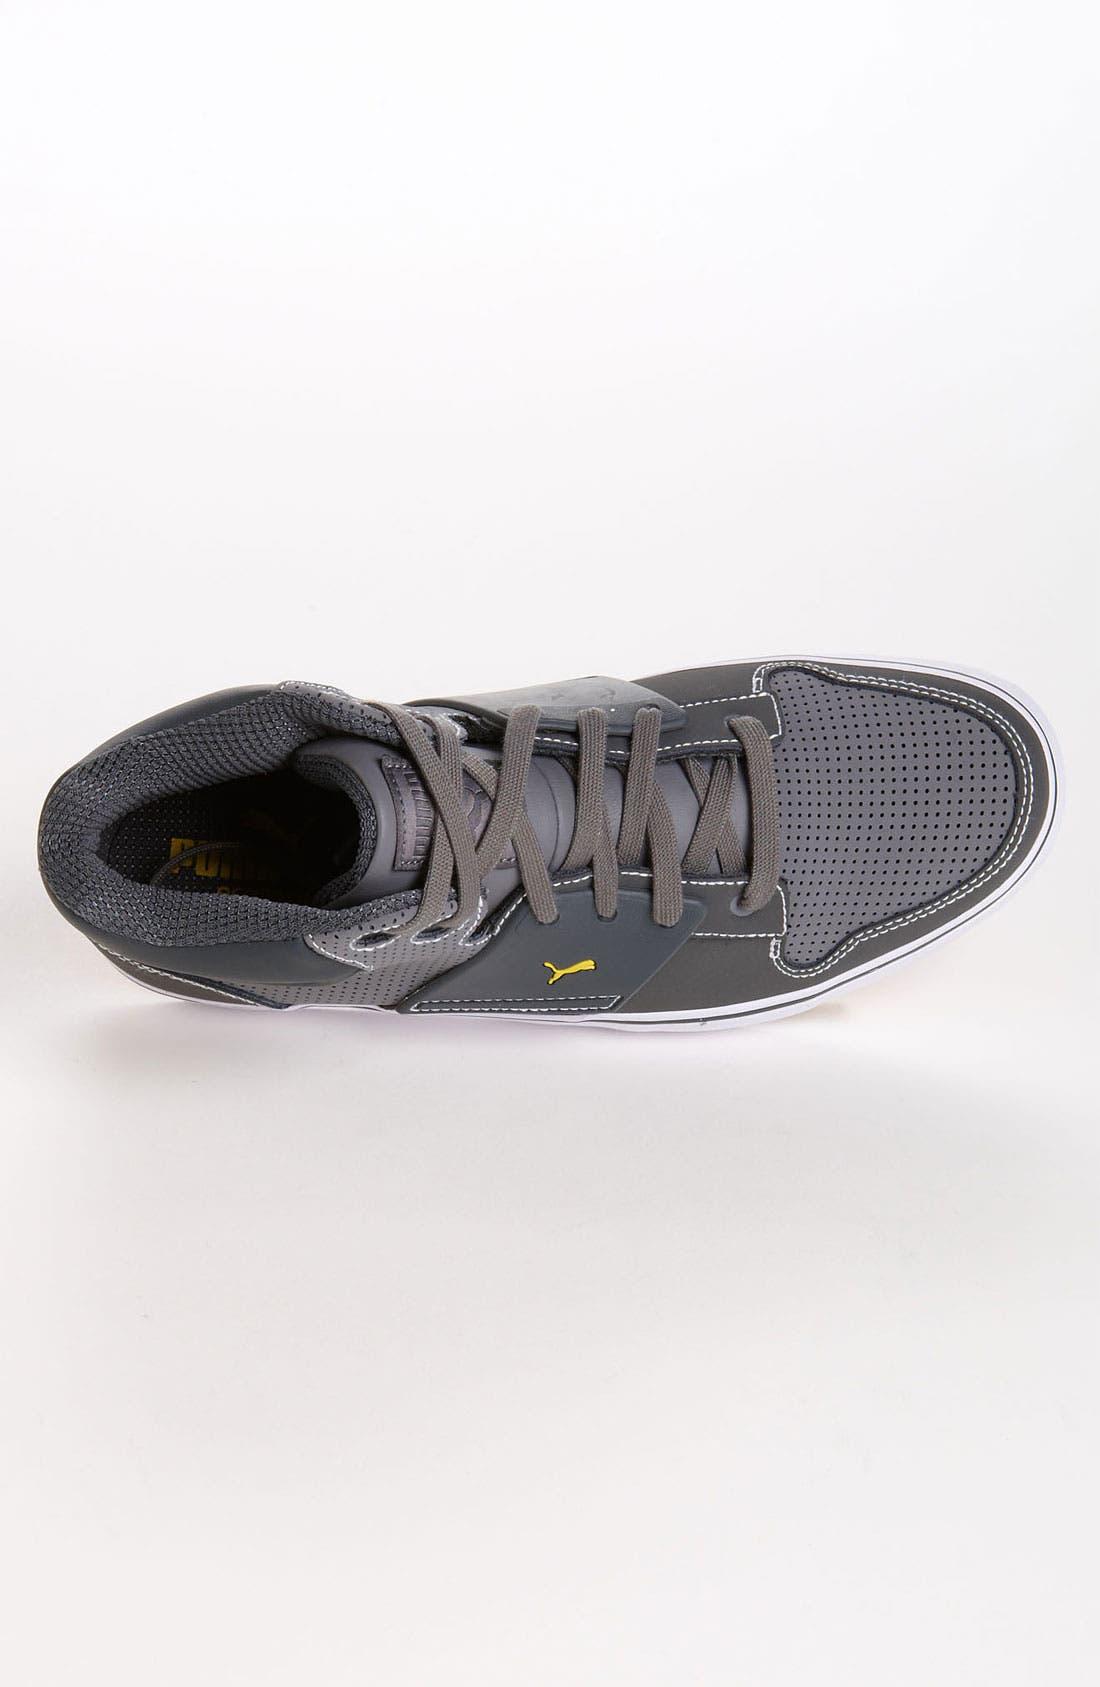 Alternate Image 3  - PUMA 'El Ace 2 Mid' Sneaker (Men)